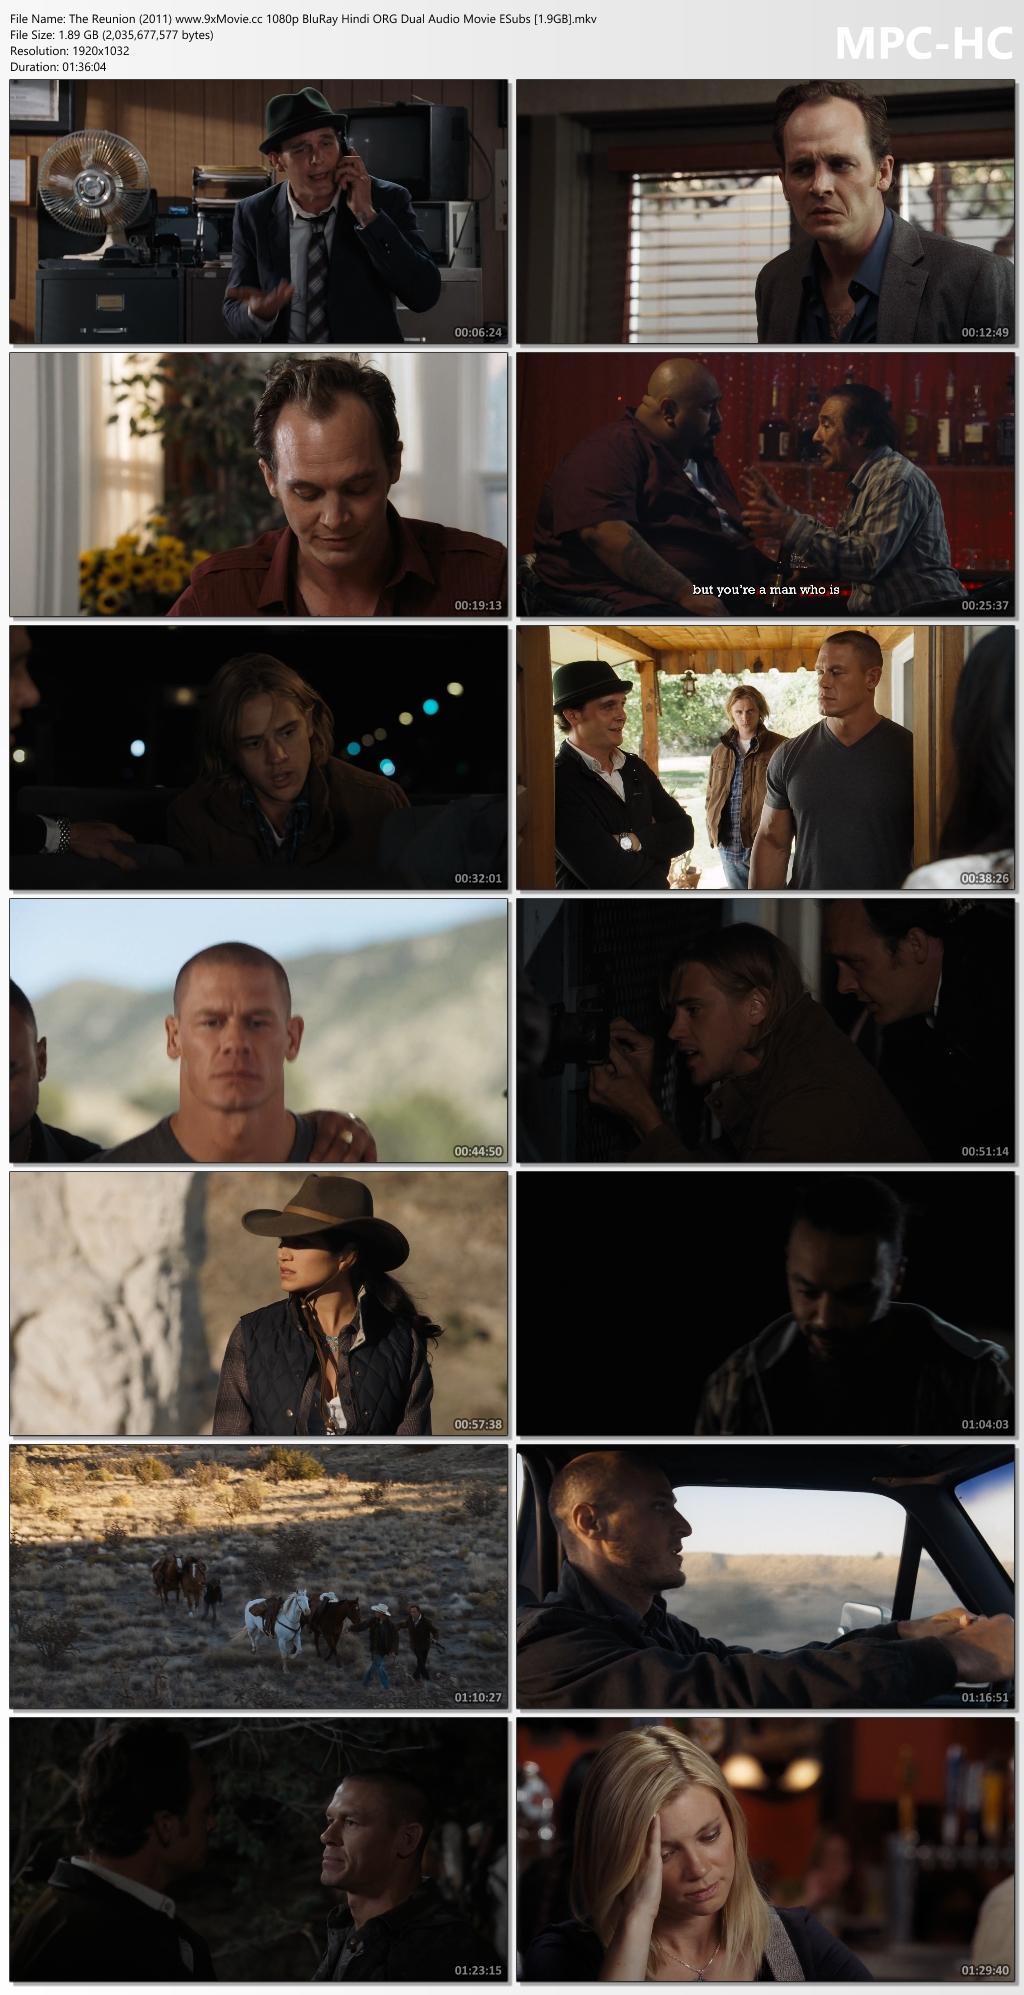 The-Reunion-2011-www-9x-Movie-cc-1080p-Blu-Ray-Hindi-ORG-Dual-Audio-Movie-ESubs-1-9-GB-mkv